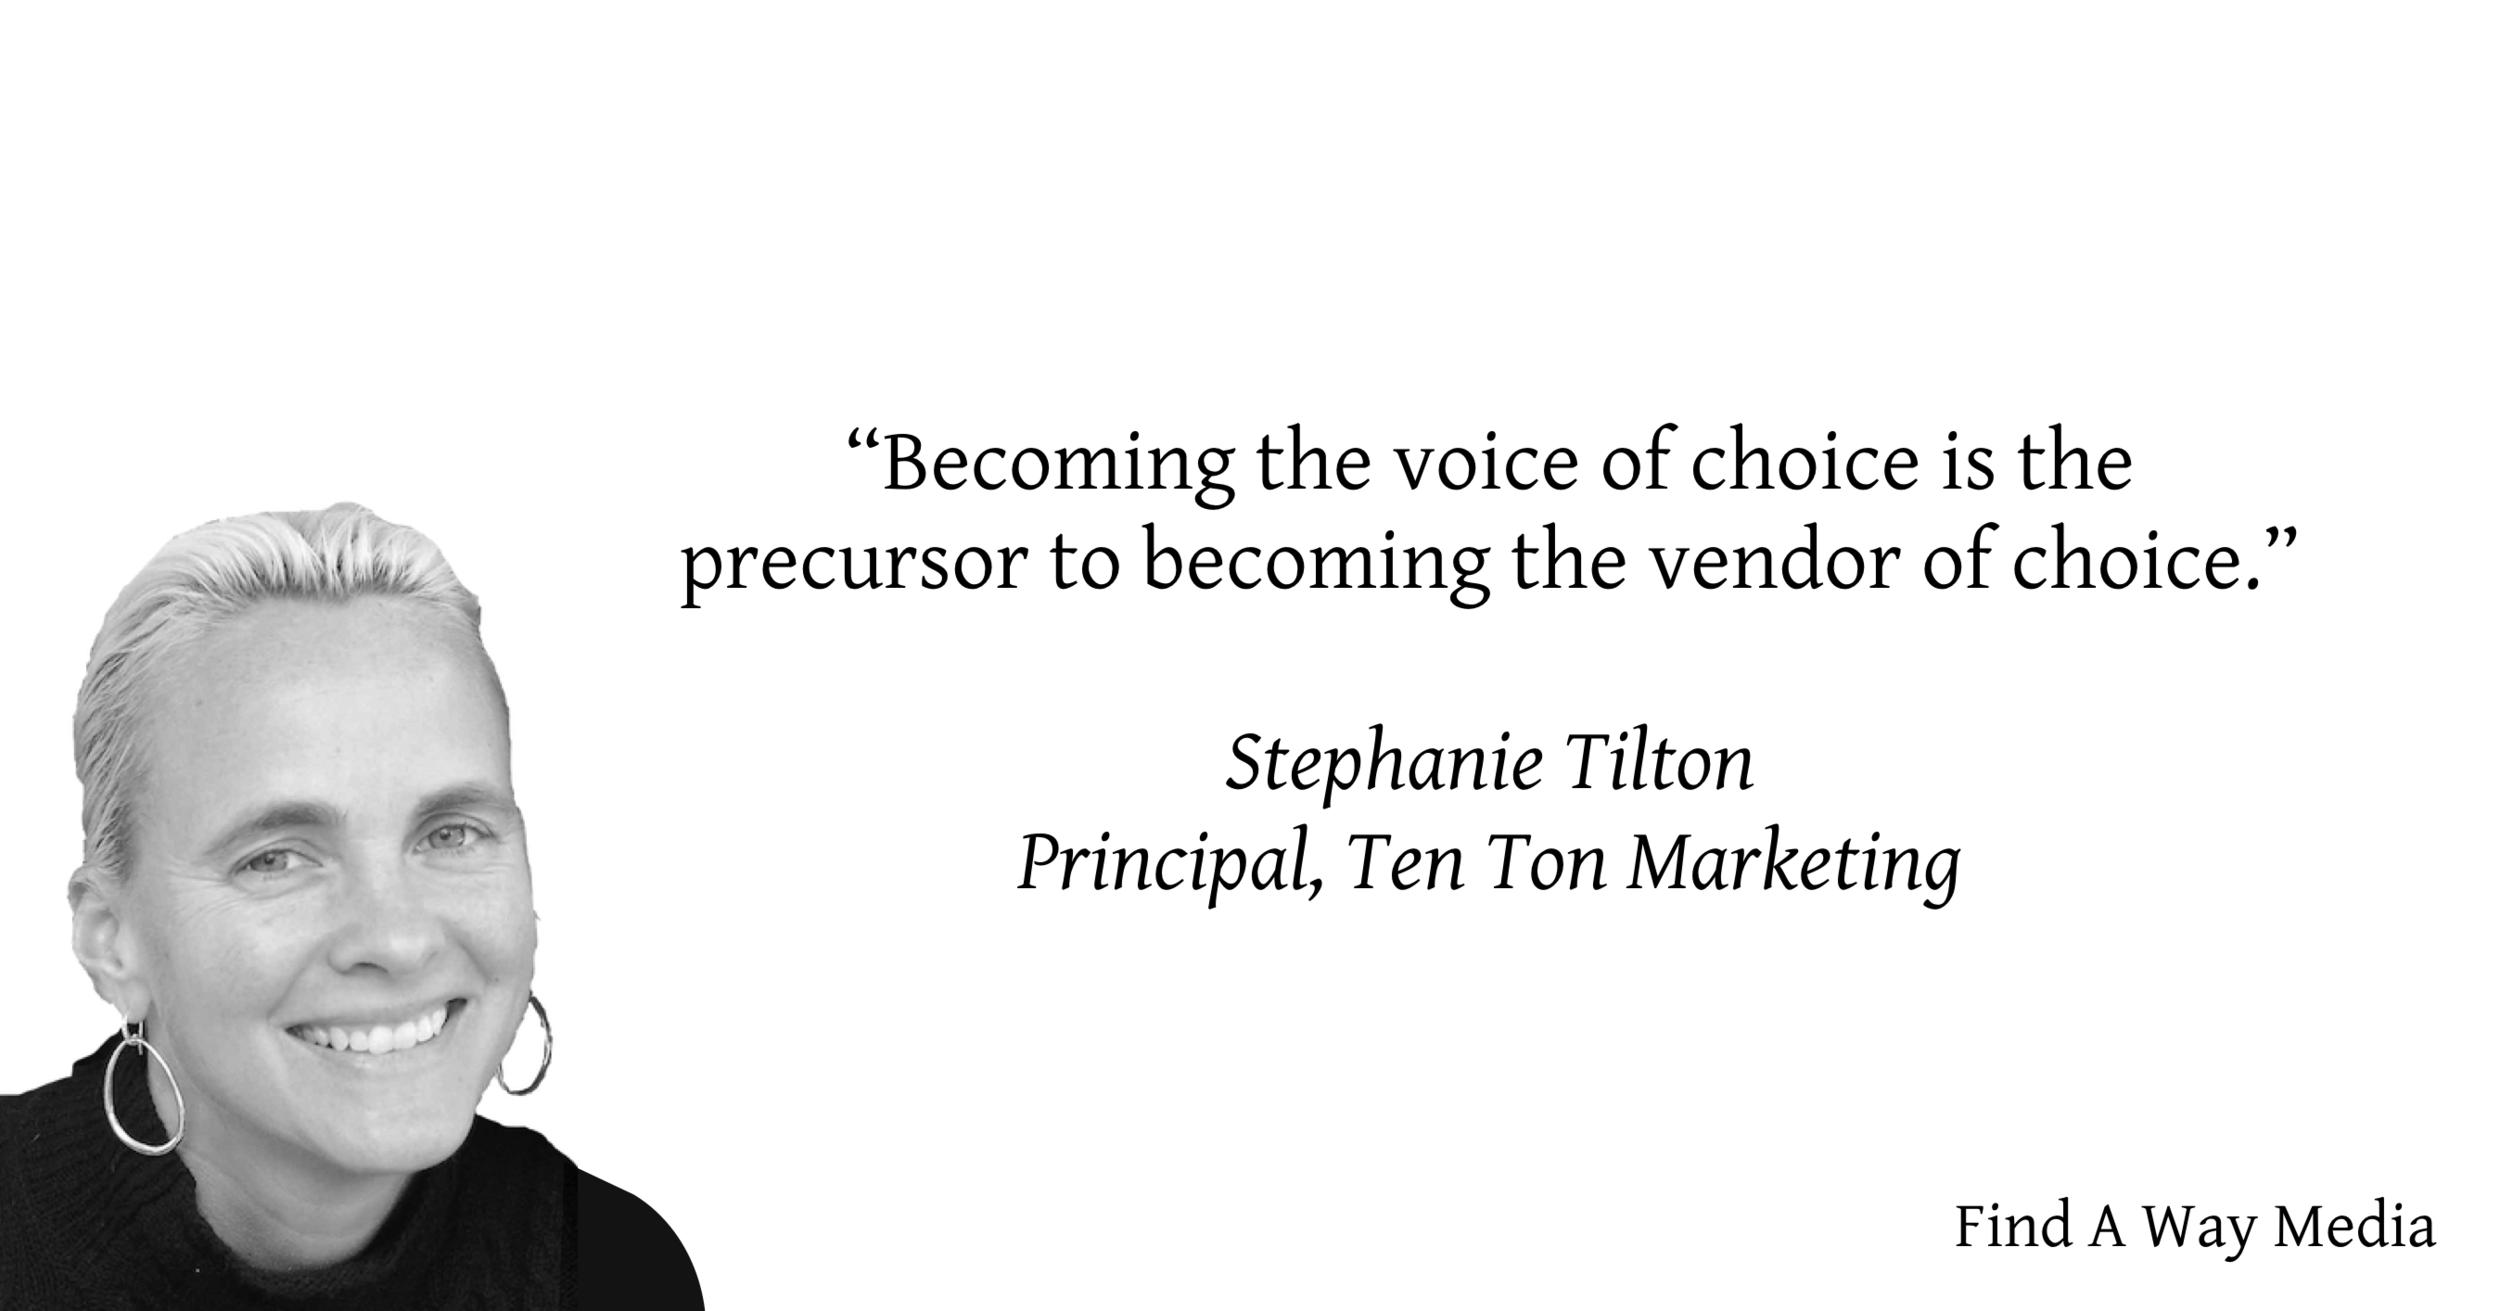 stephanie tilton ten ton marketing voice of choice find a way media